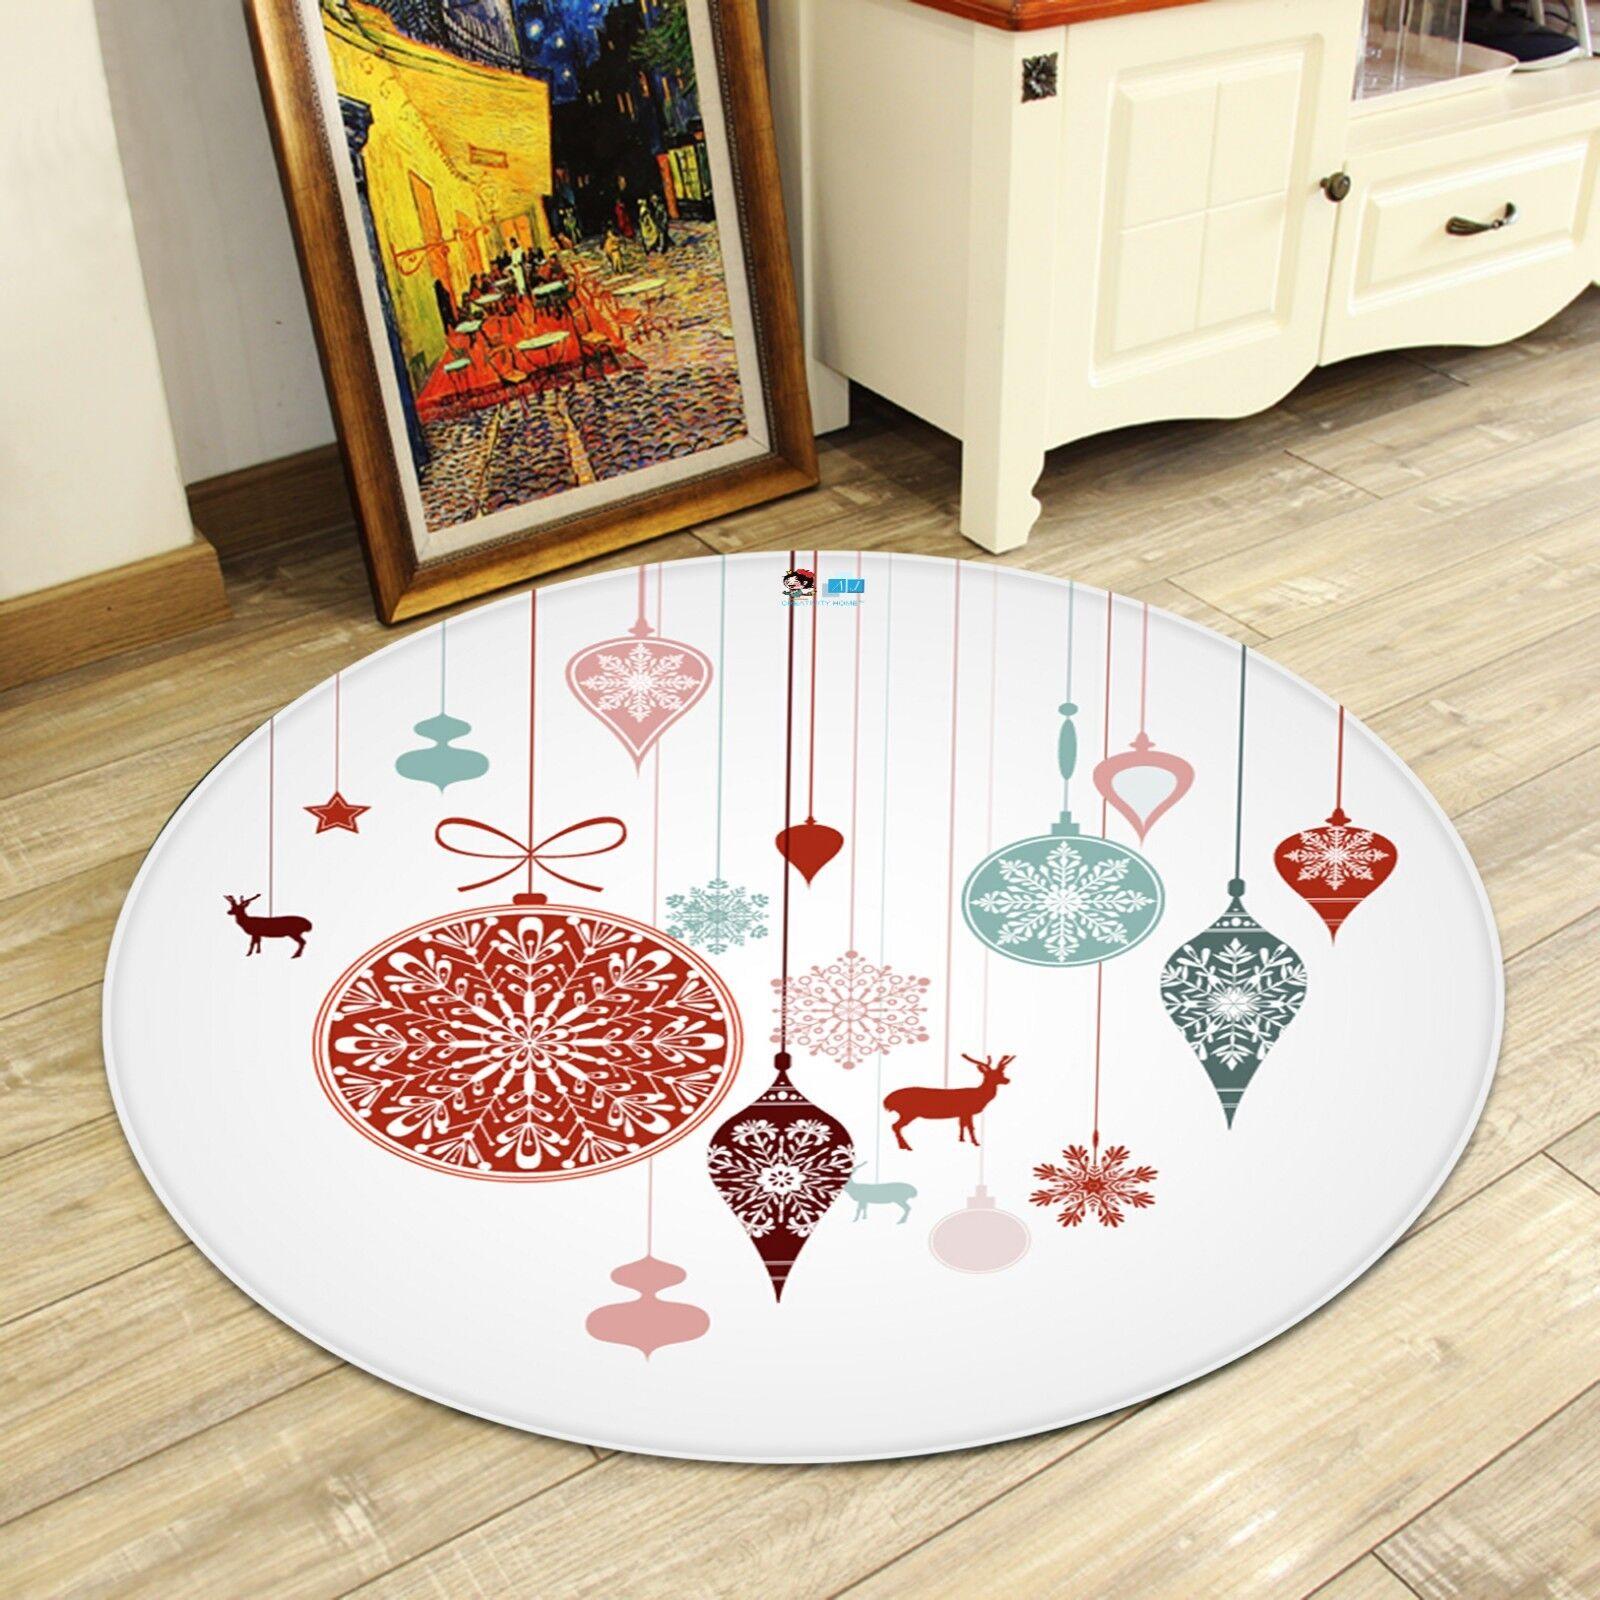 3D Christmas Xmas 821 Non Slip Rug Room Mat Round Quality elegant photo carpet